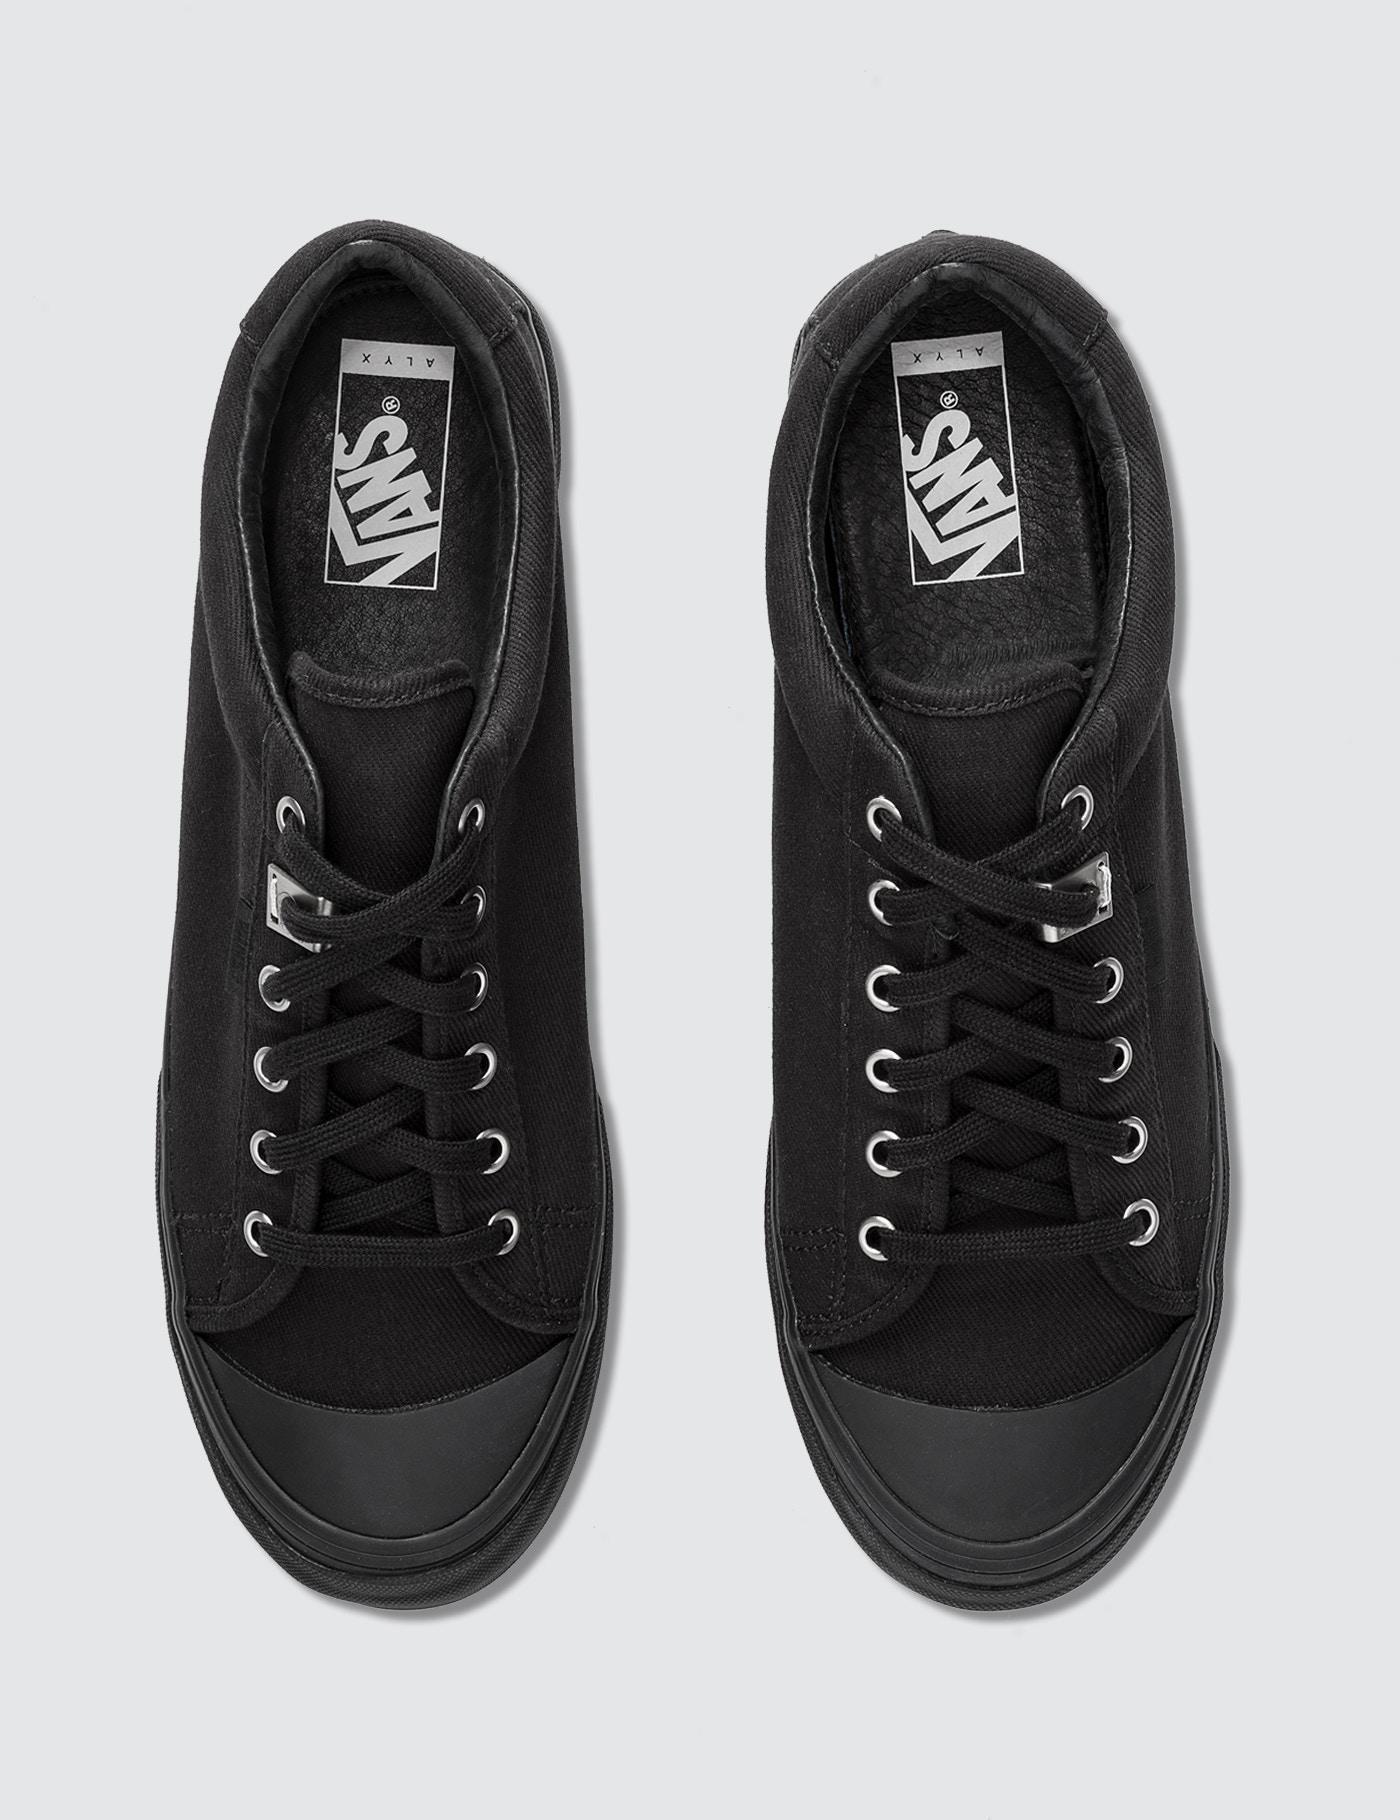 d69c1ec372e116 Lyst - Vans Alyx X Style 29 Tread Sole in Black